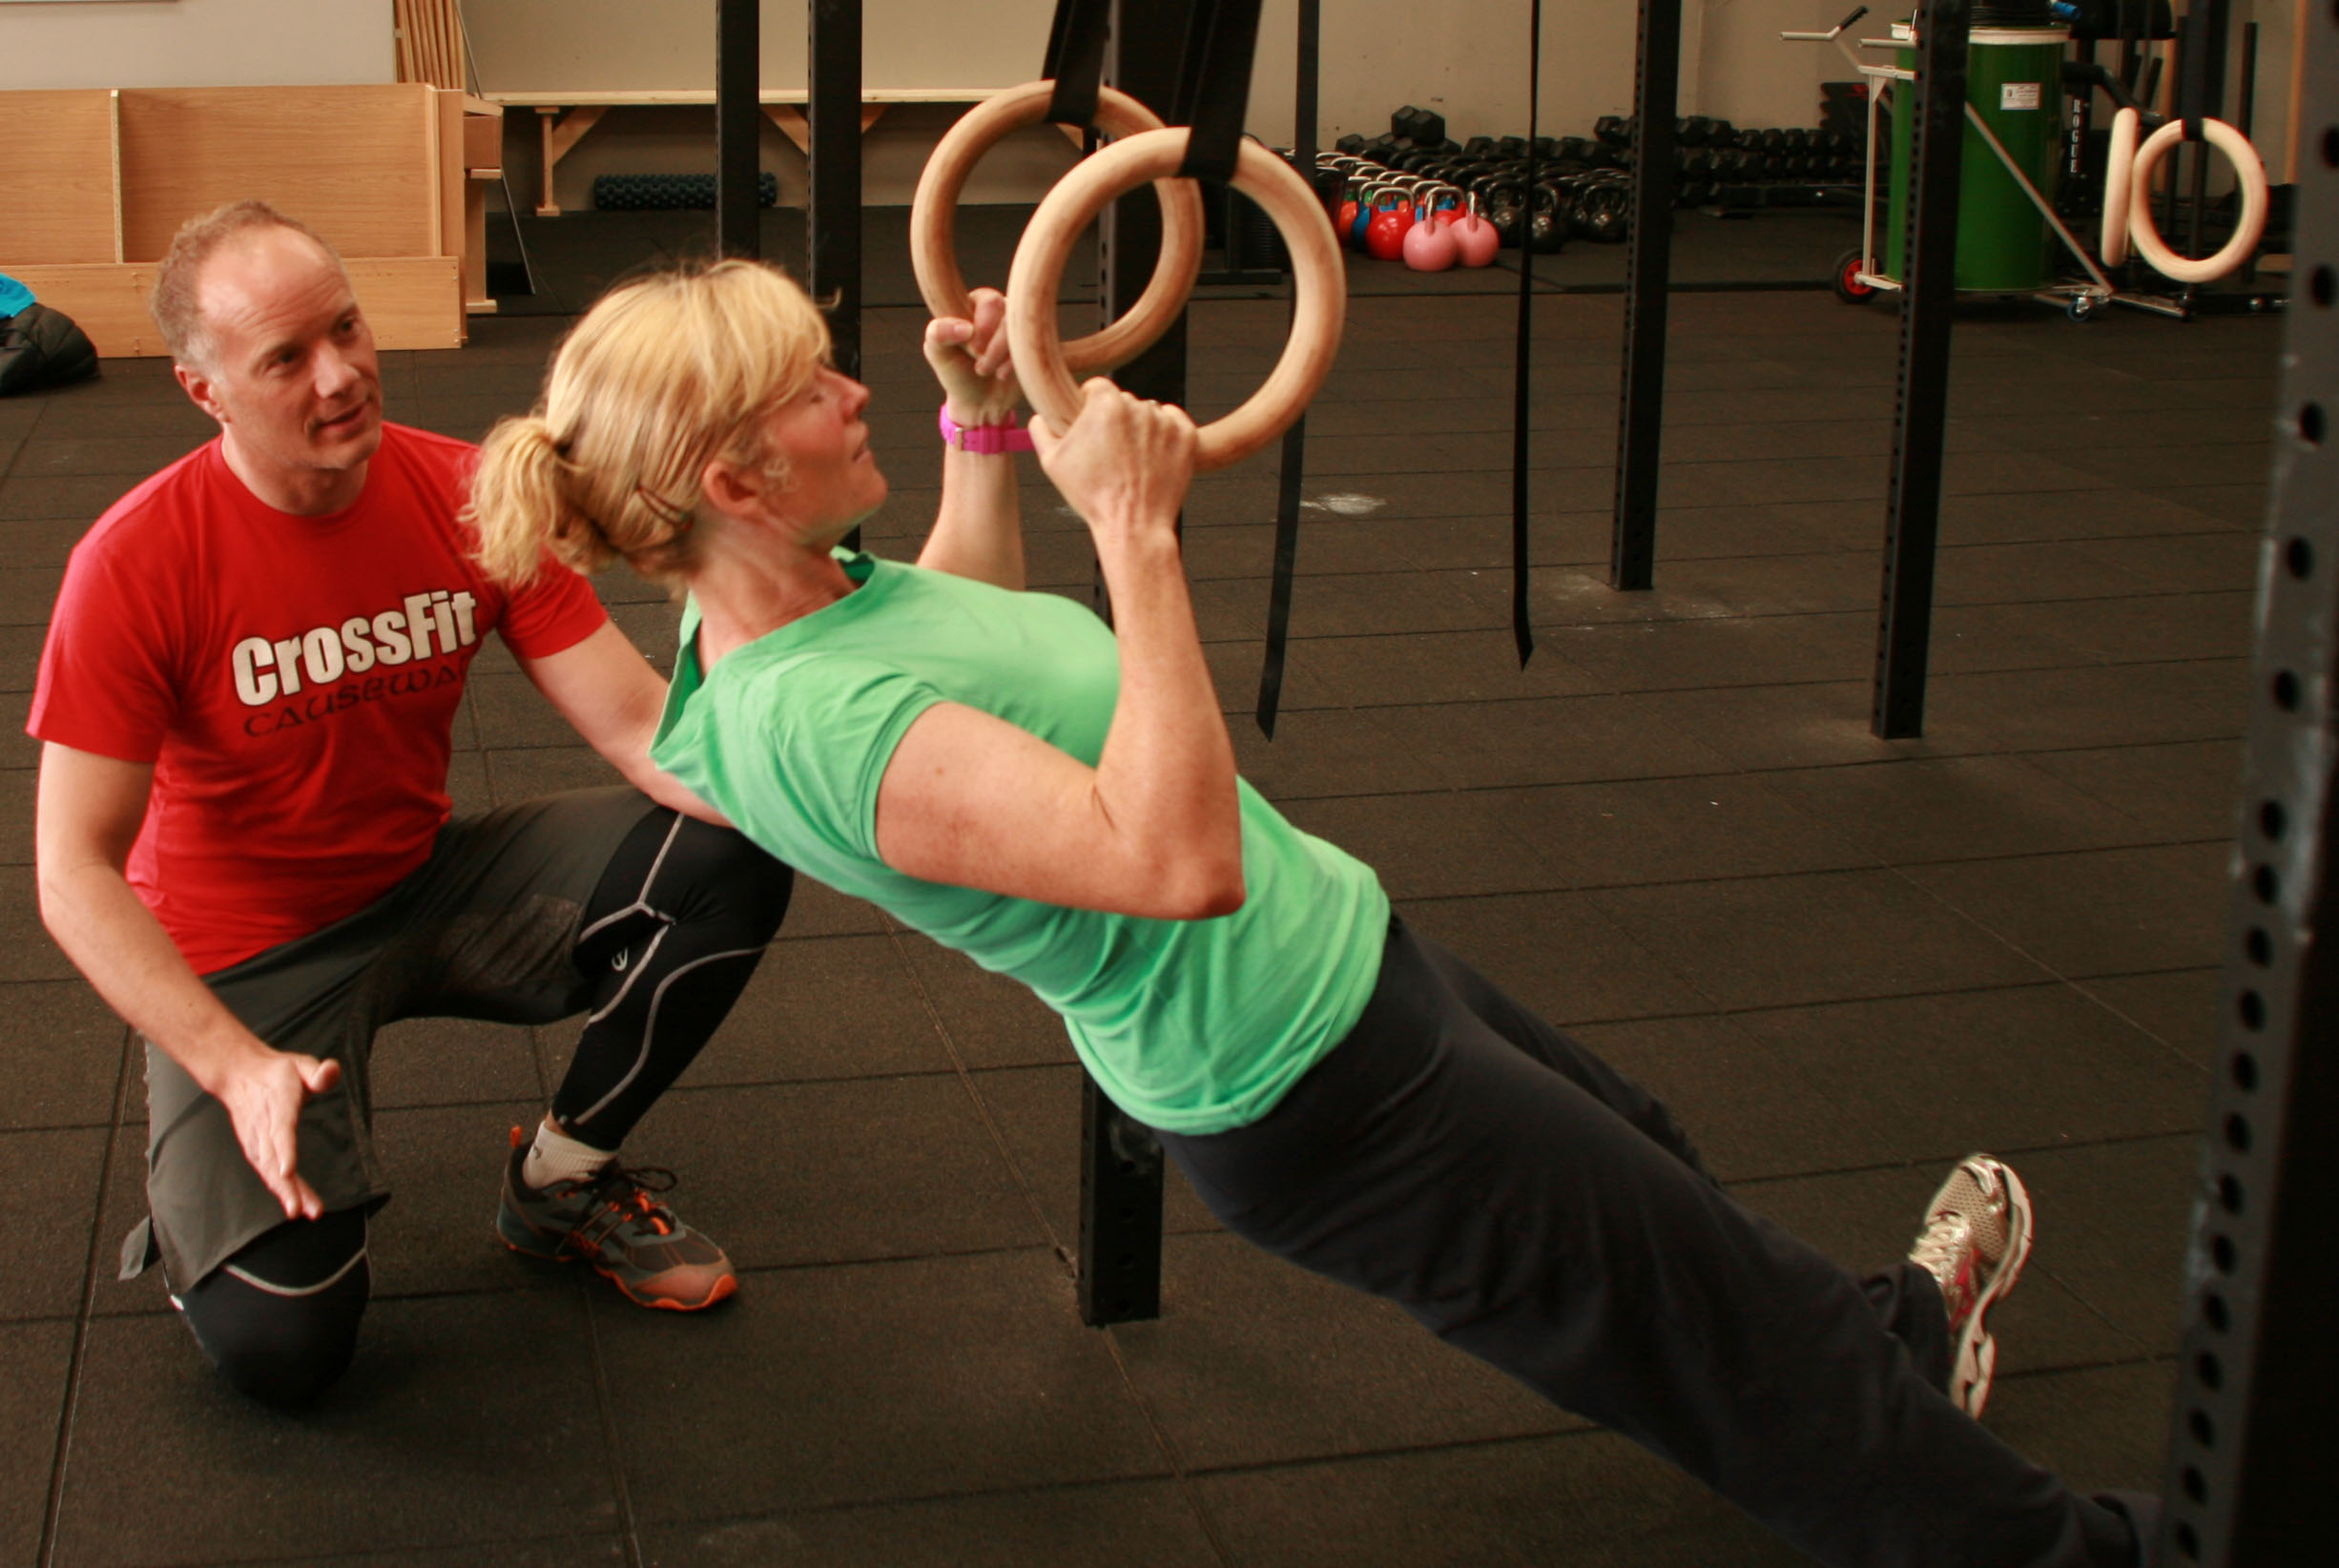 Les 5 rôles essentiels d'un coach de CrossFit !